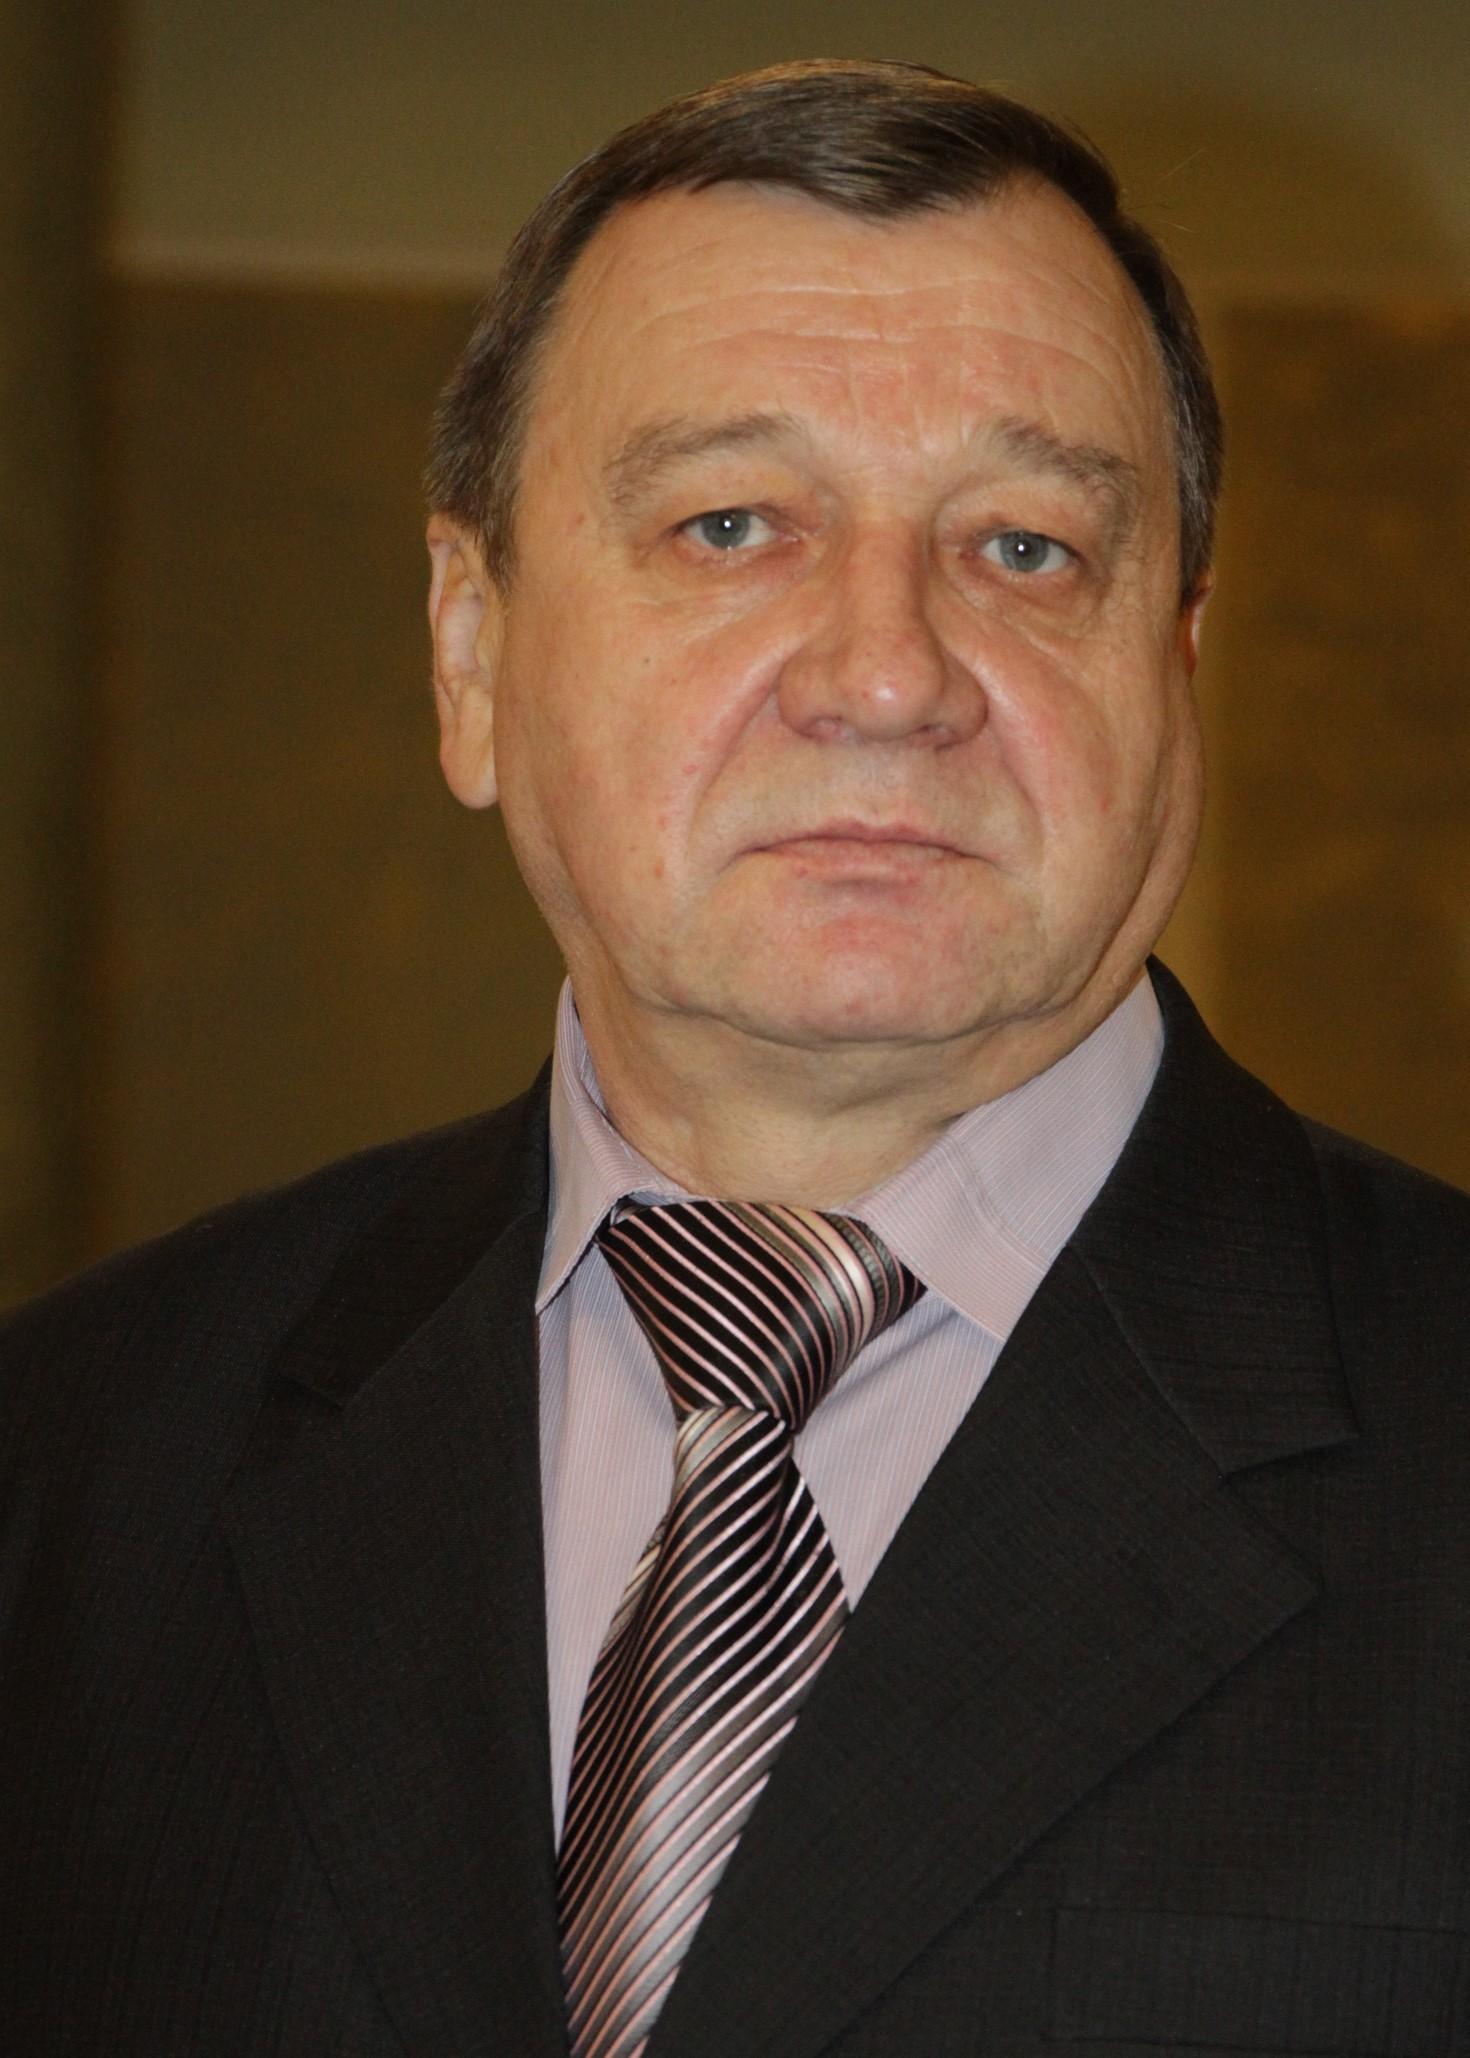 Иванов Анатолий Викторович